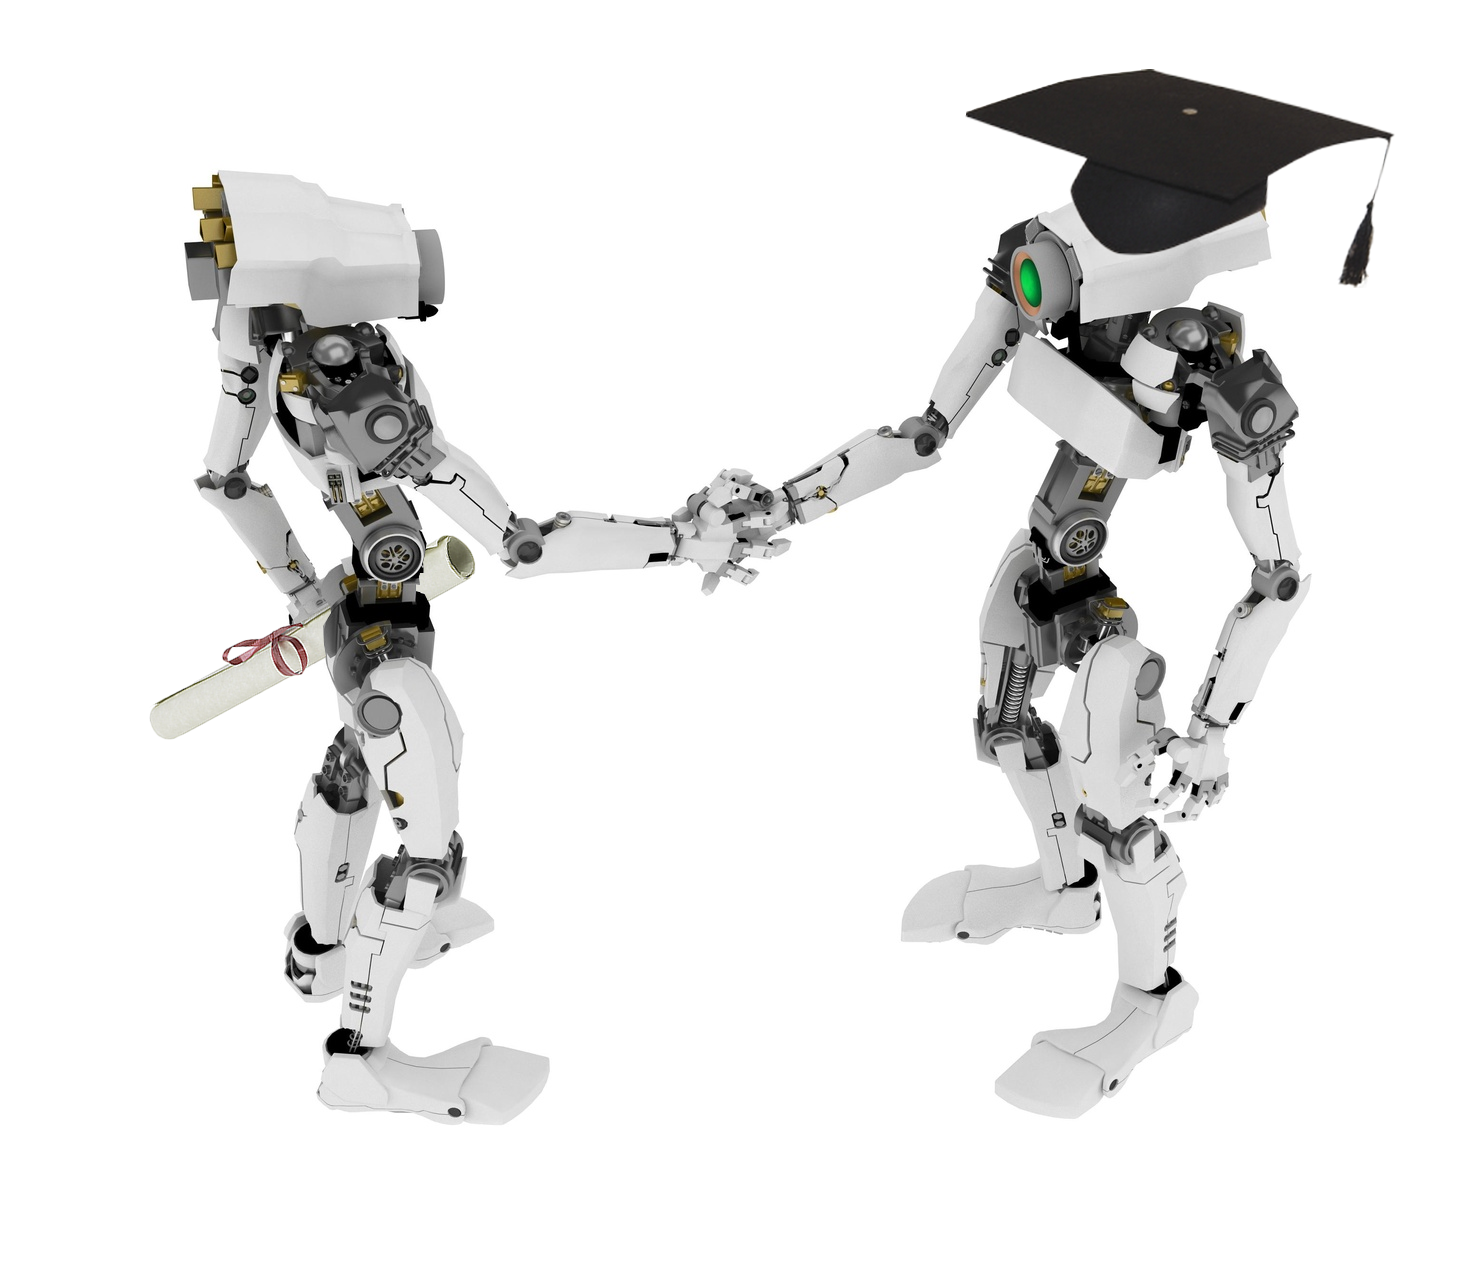 Robot Advance Teaching Information